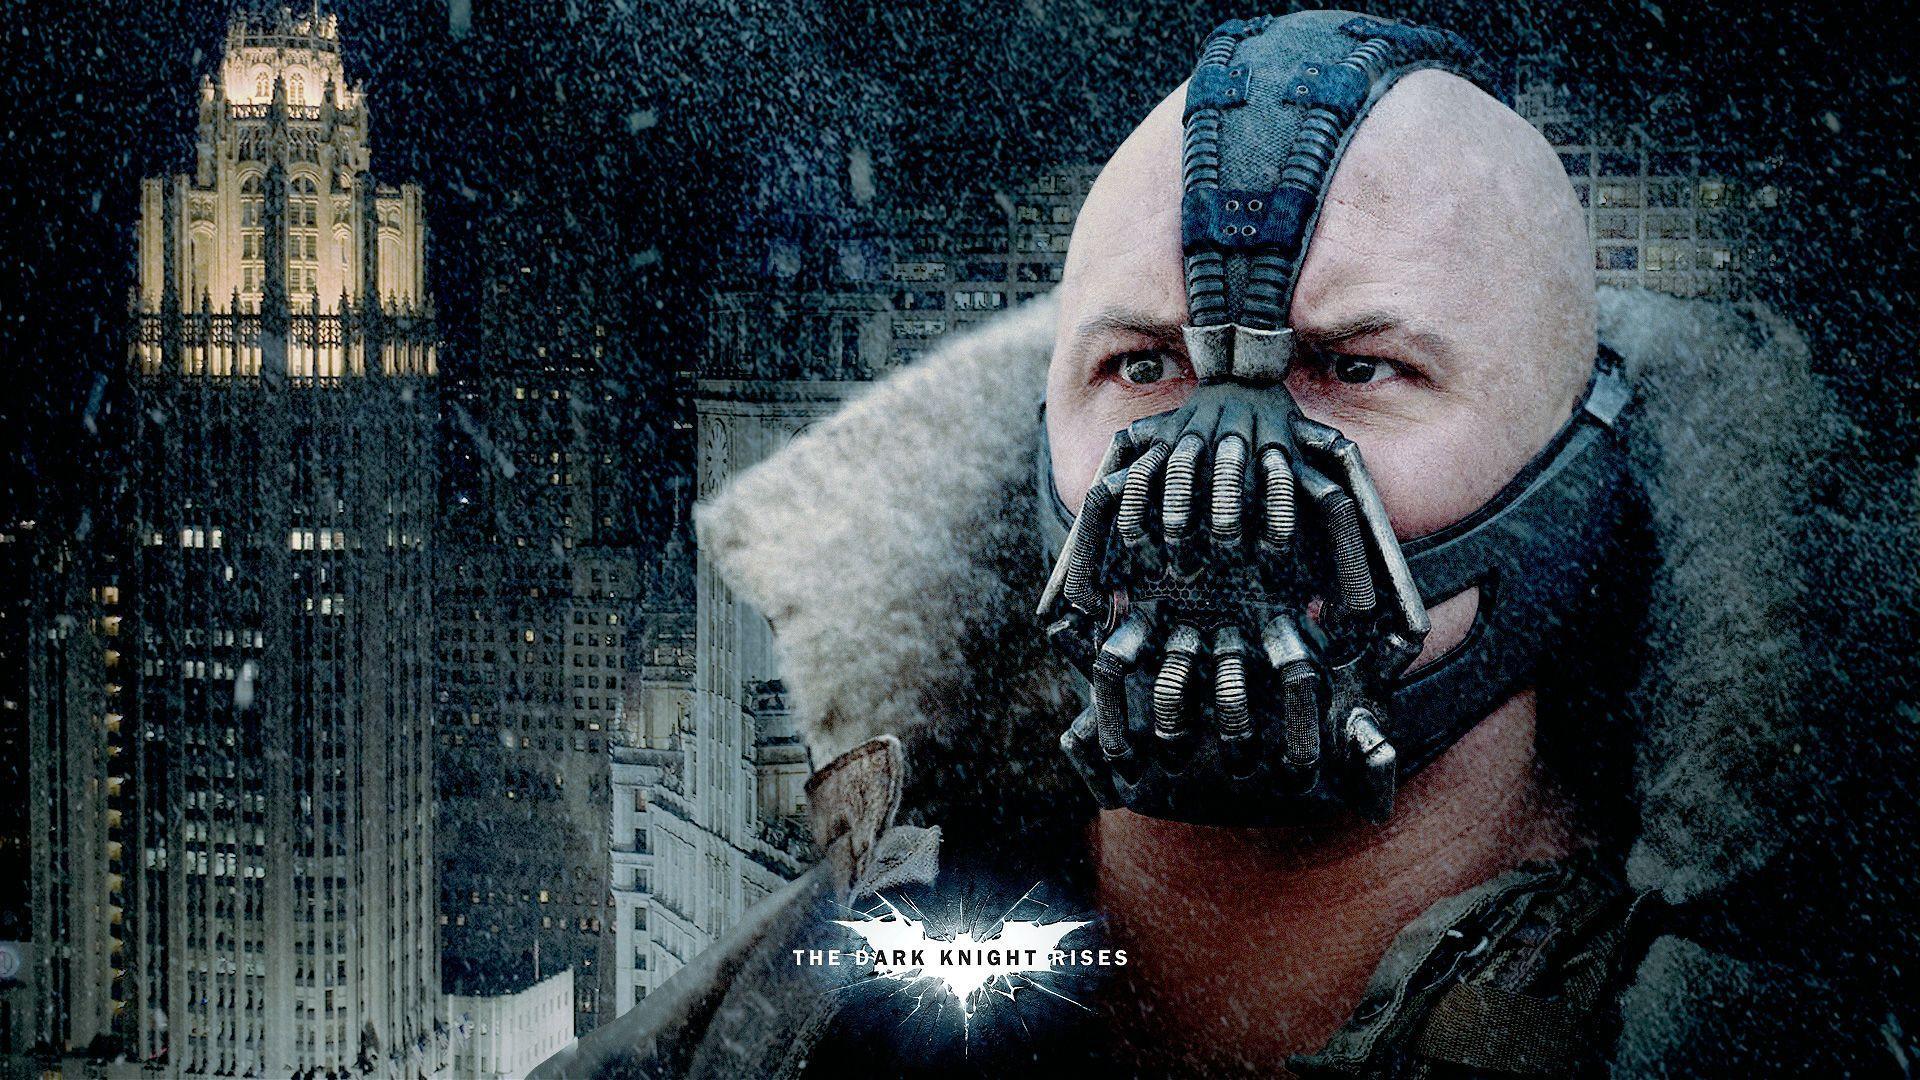 Dark Knight Rises Bane Wallpapers Top Free Dark Knight